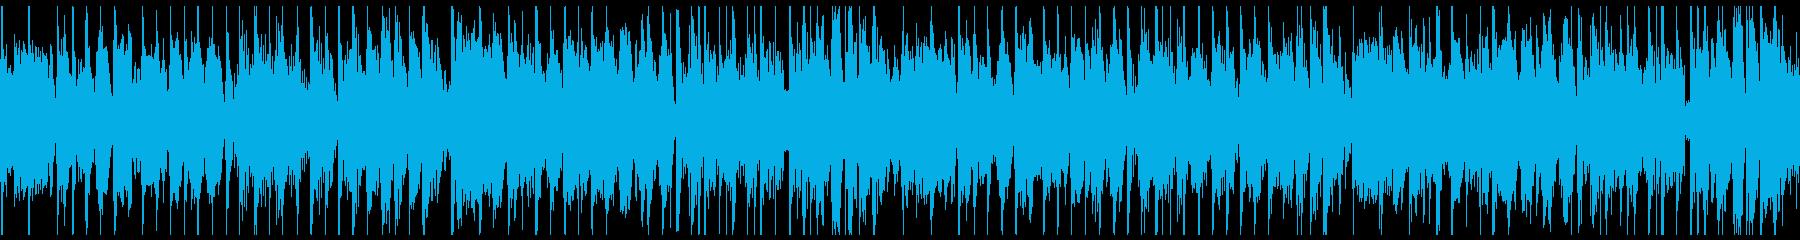 Drum&Bassは、都会のジャン...の再生済みの波形